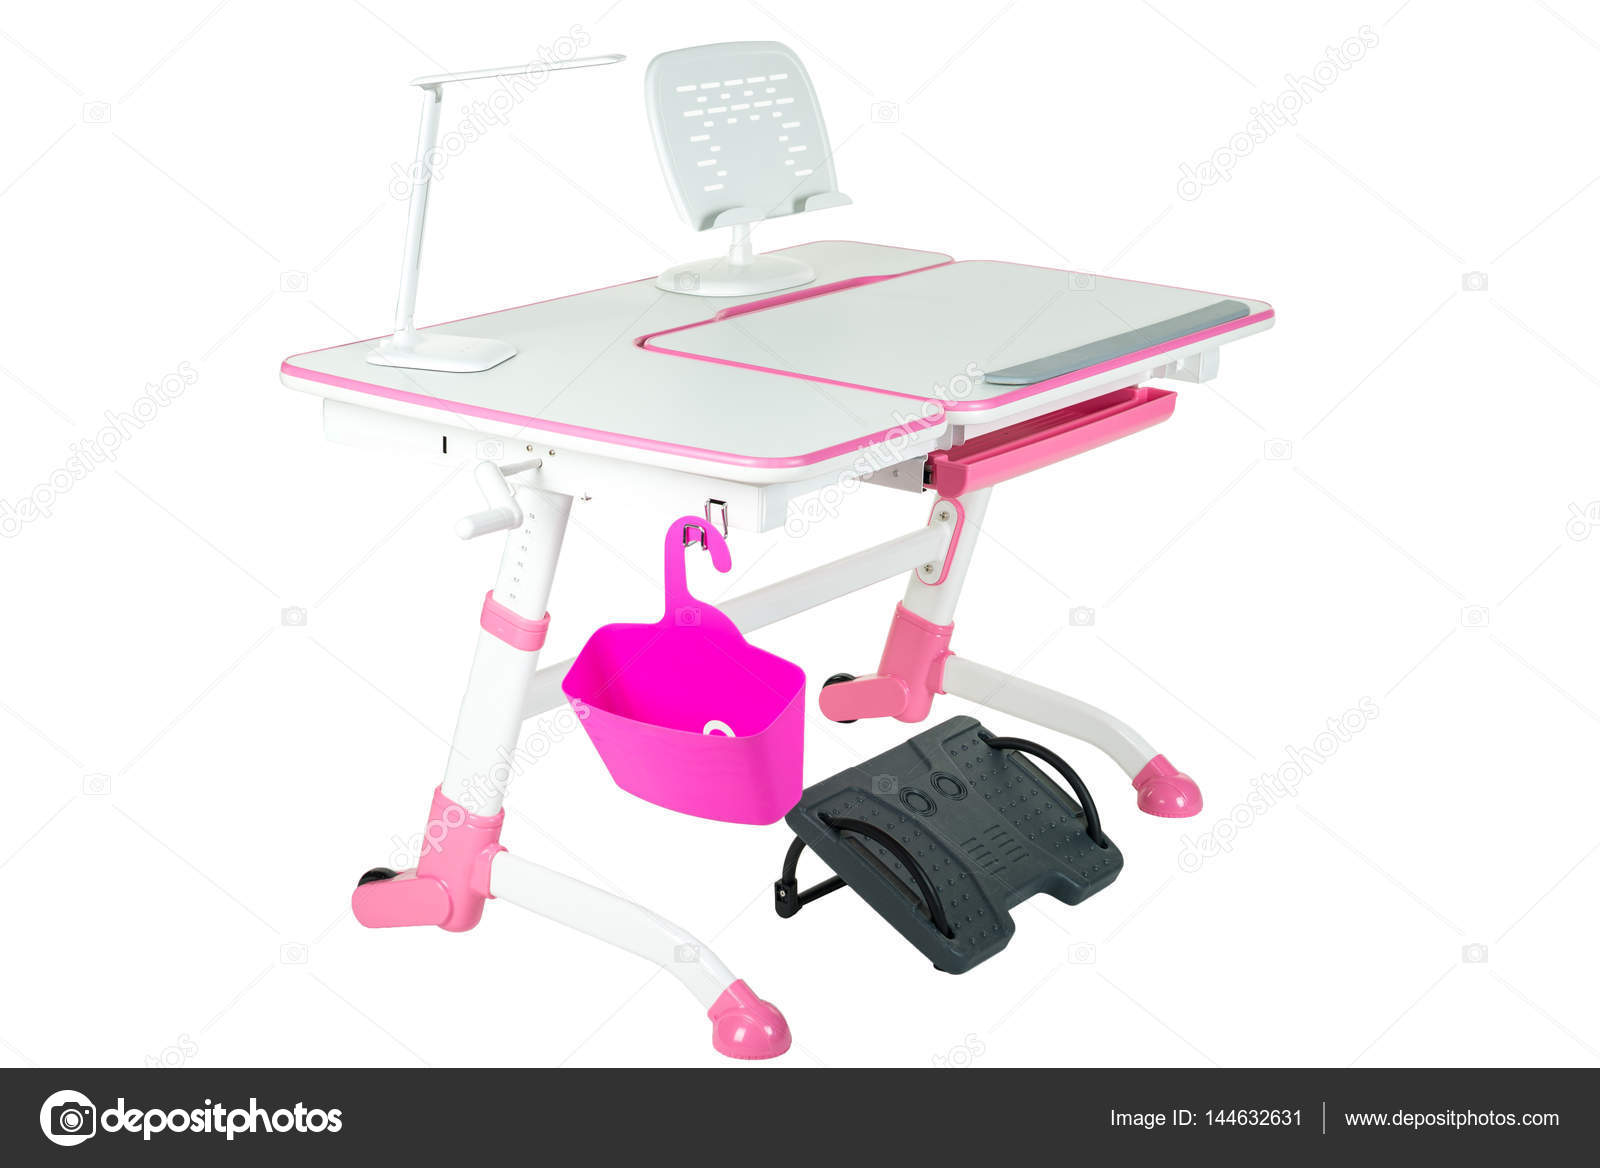 Pink School Desk Basket Lamp And Black Support Under Legs Stock